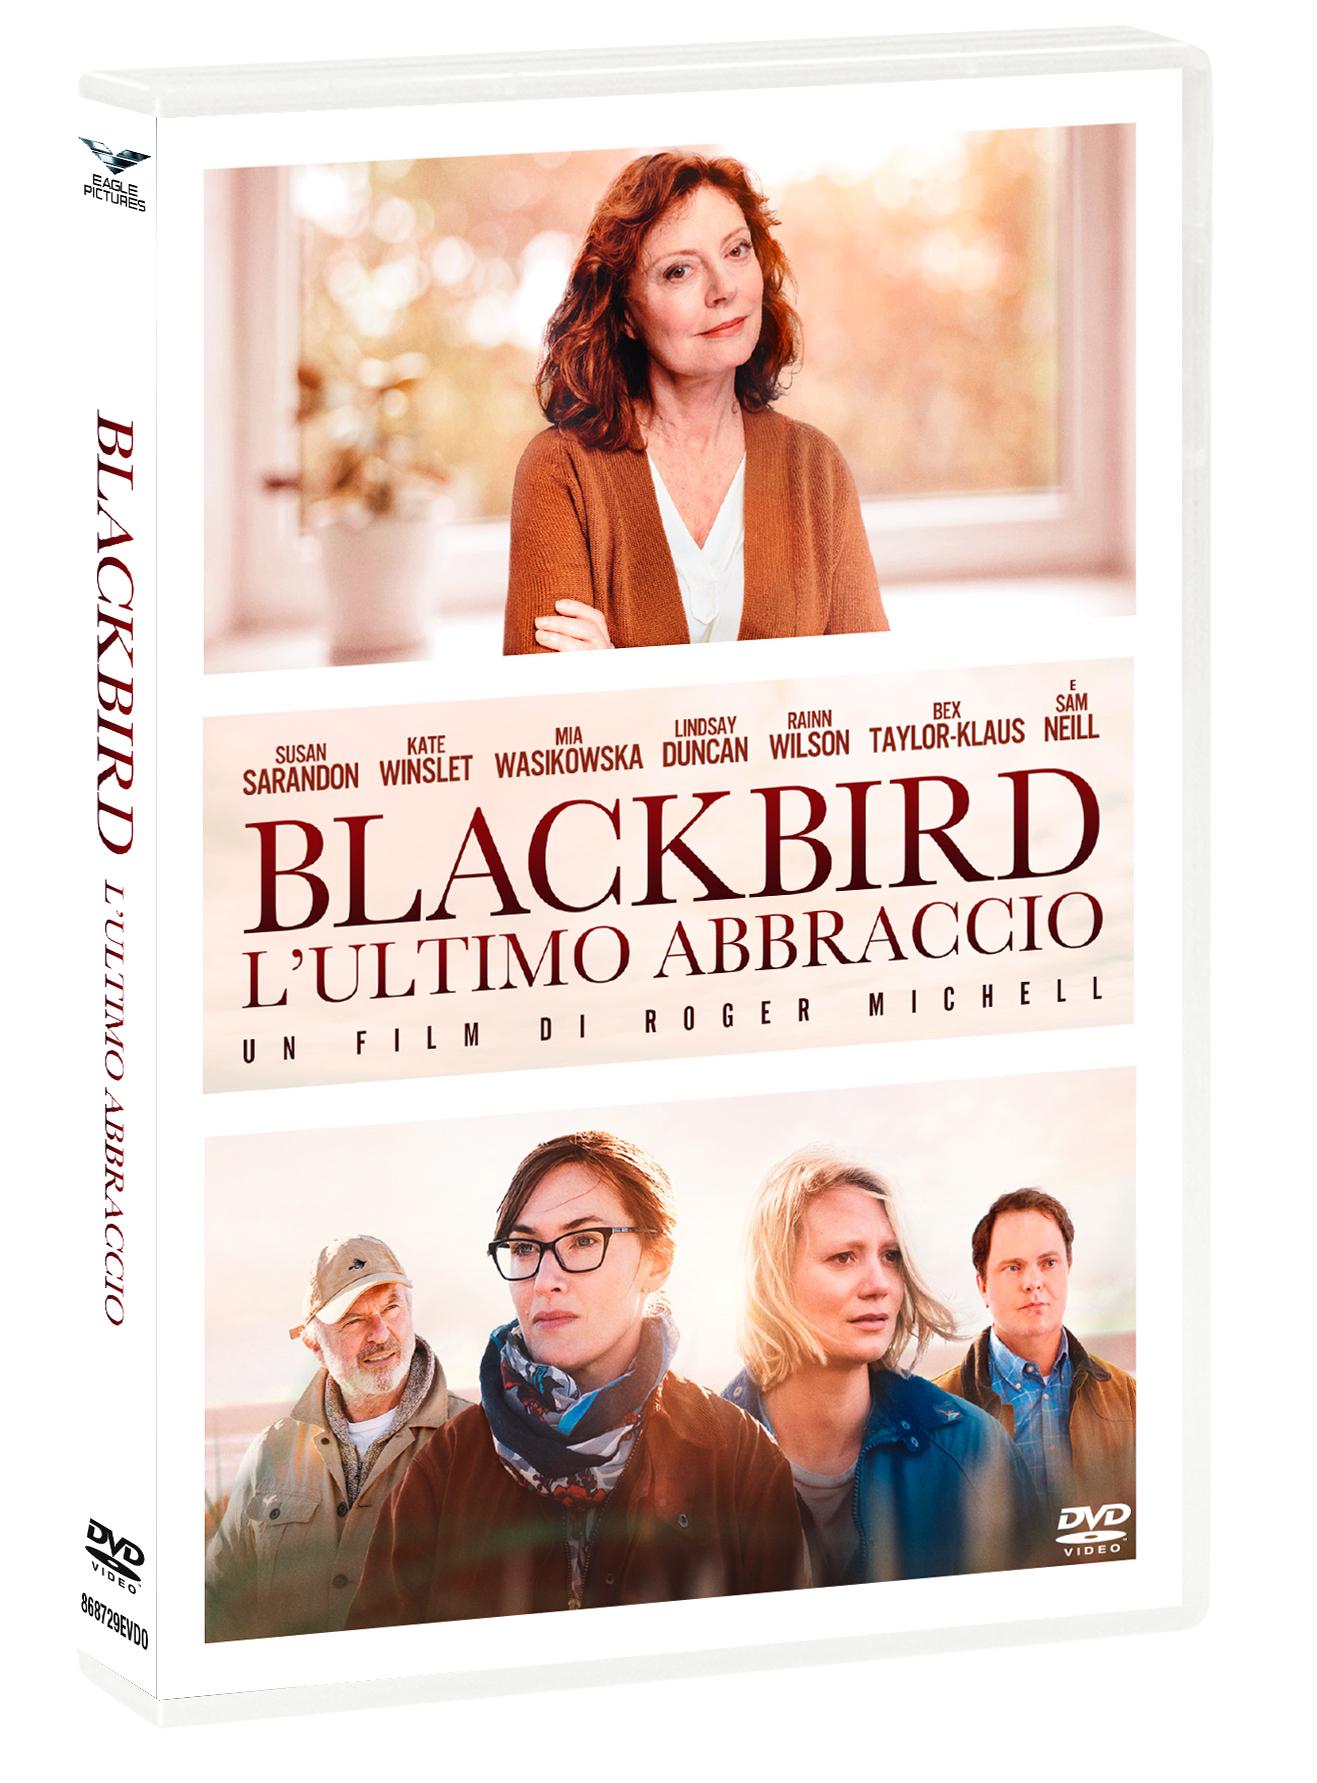 BLACKBIRD - L'ULTIMO ABBRACCIO (DVD)